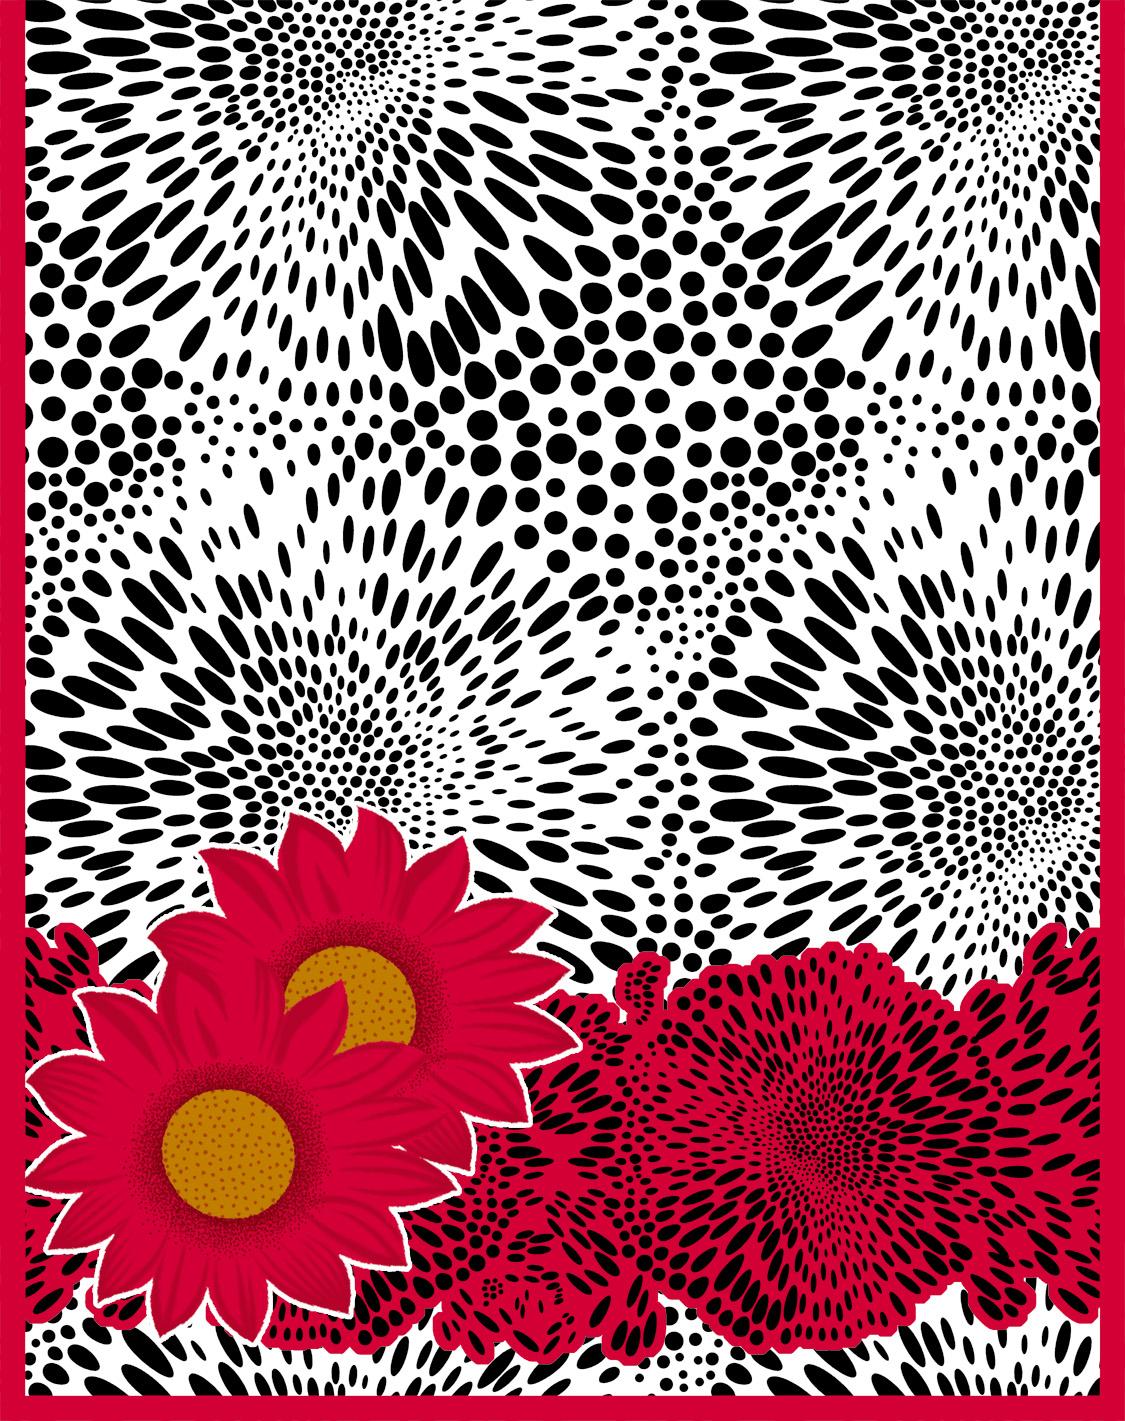 Textile Design Patterns Free Fabric Designs Patterns